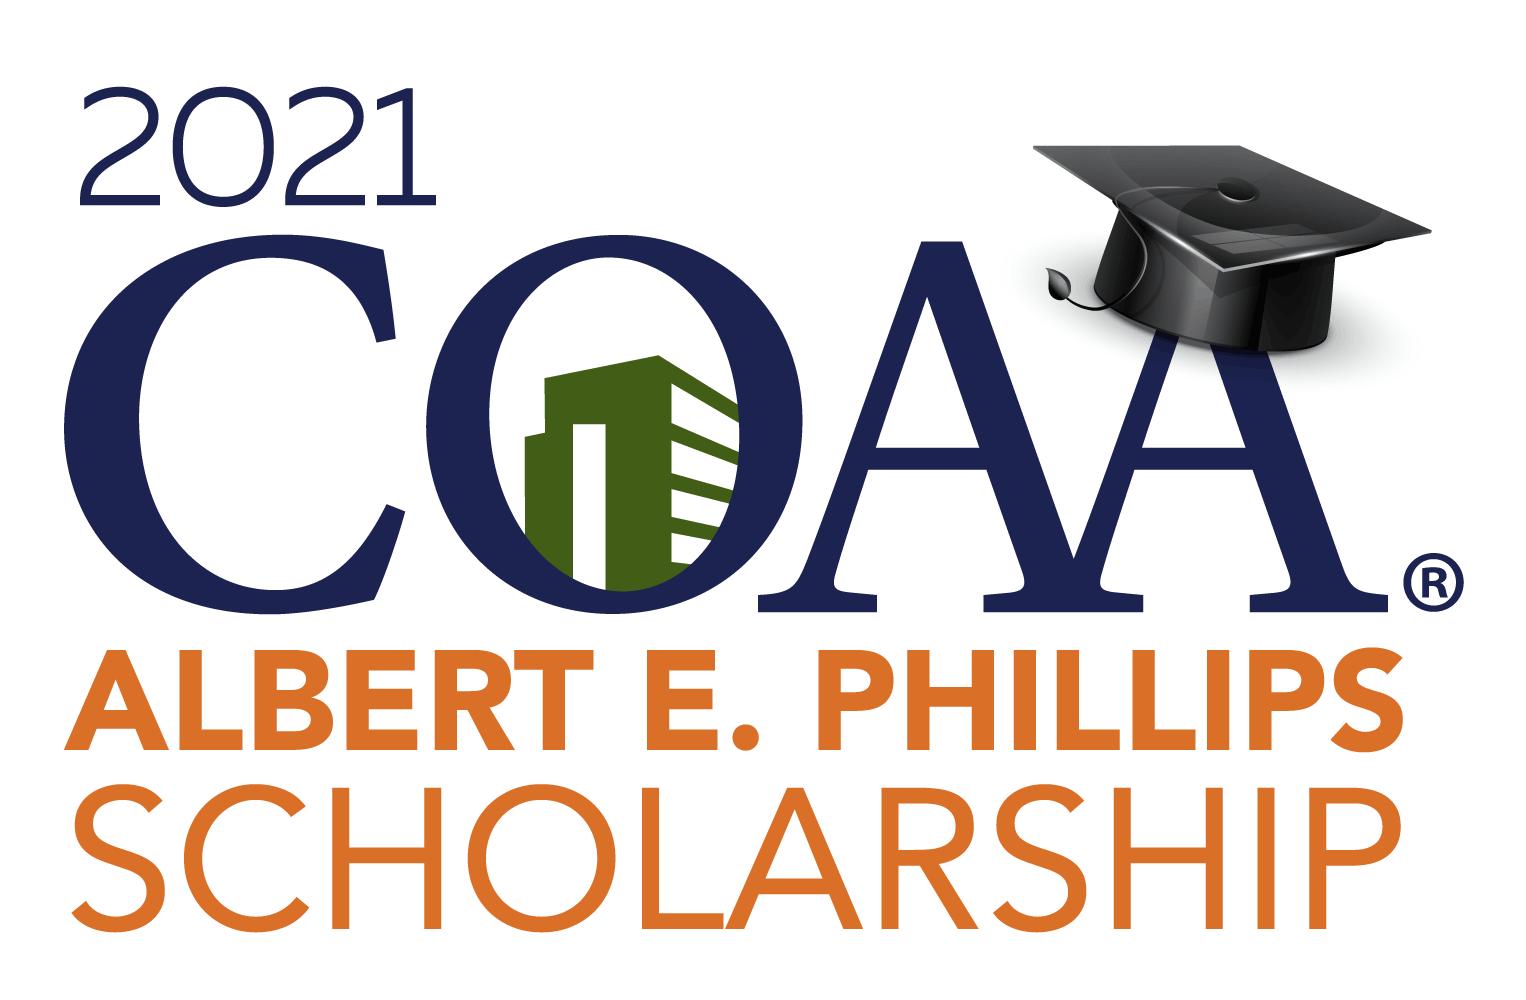 COAA Scholarship